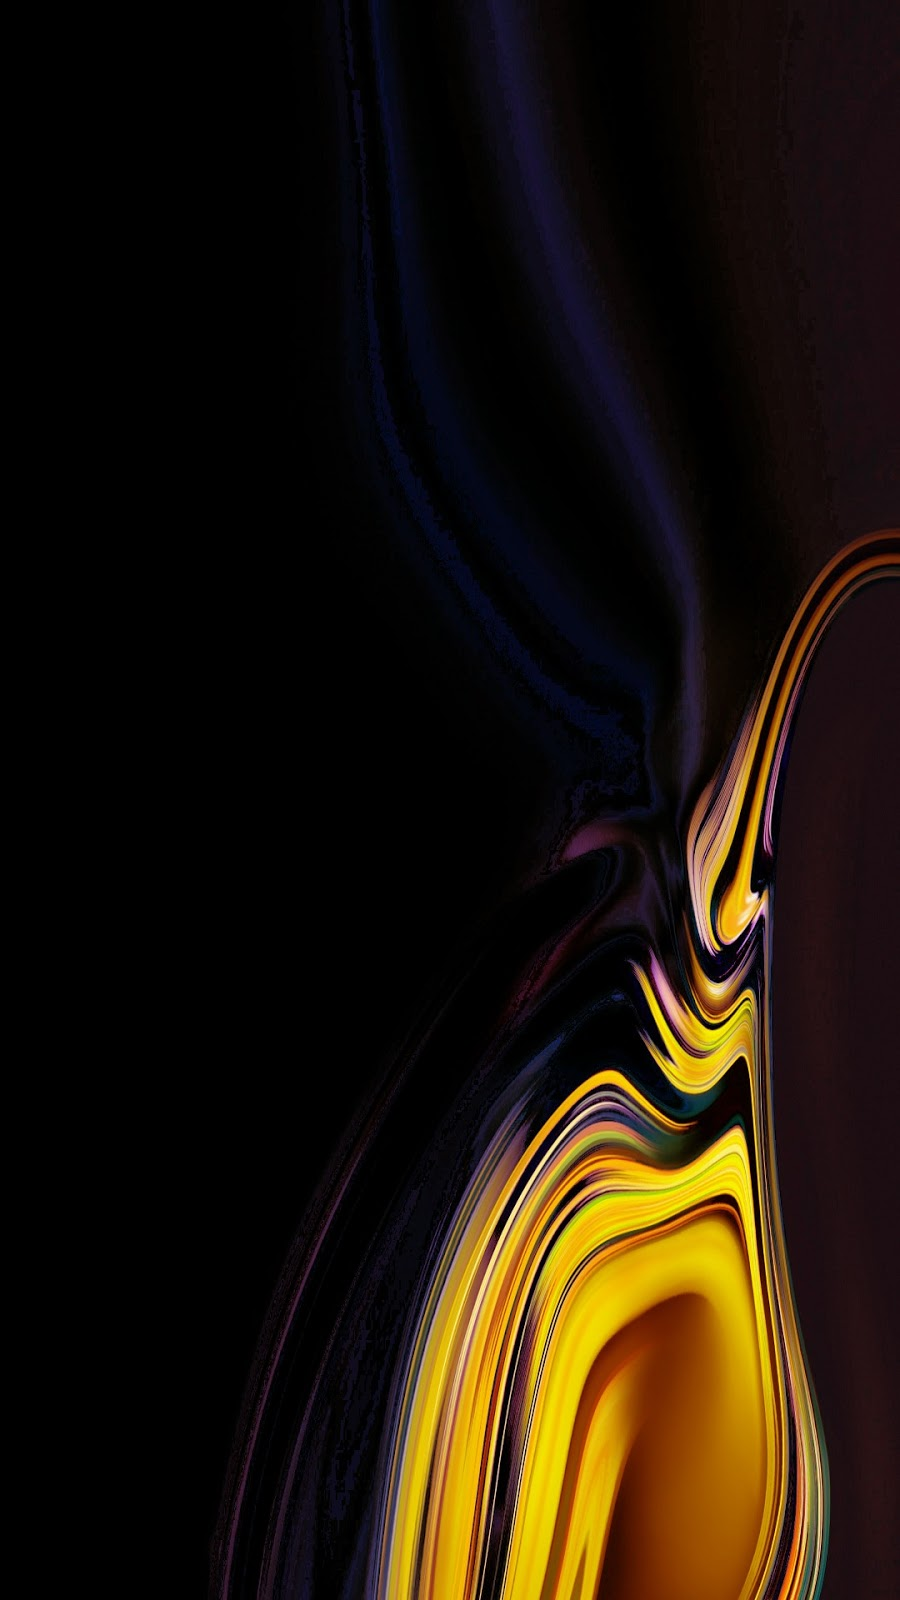 Galaxy Note 9 Wallpaper Posted By Samantha Tremblay